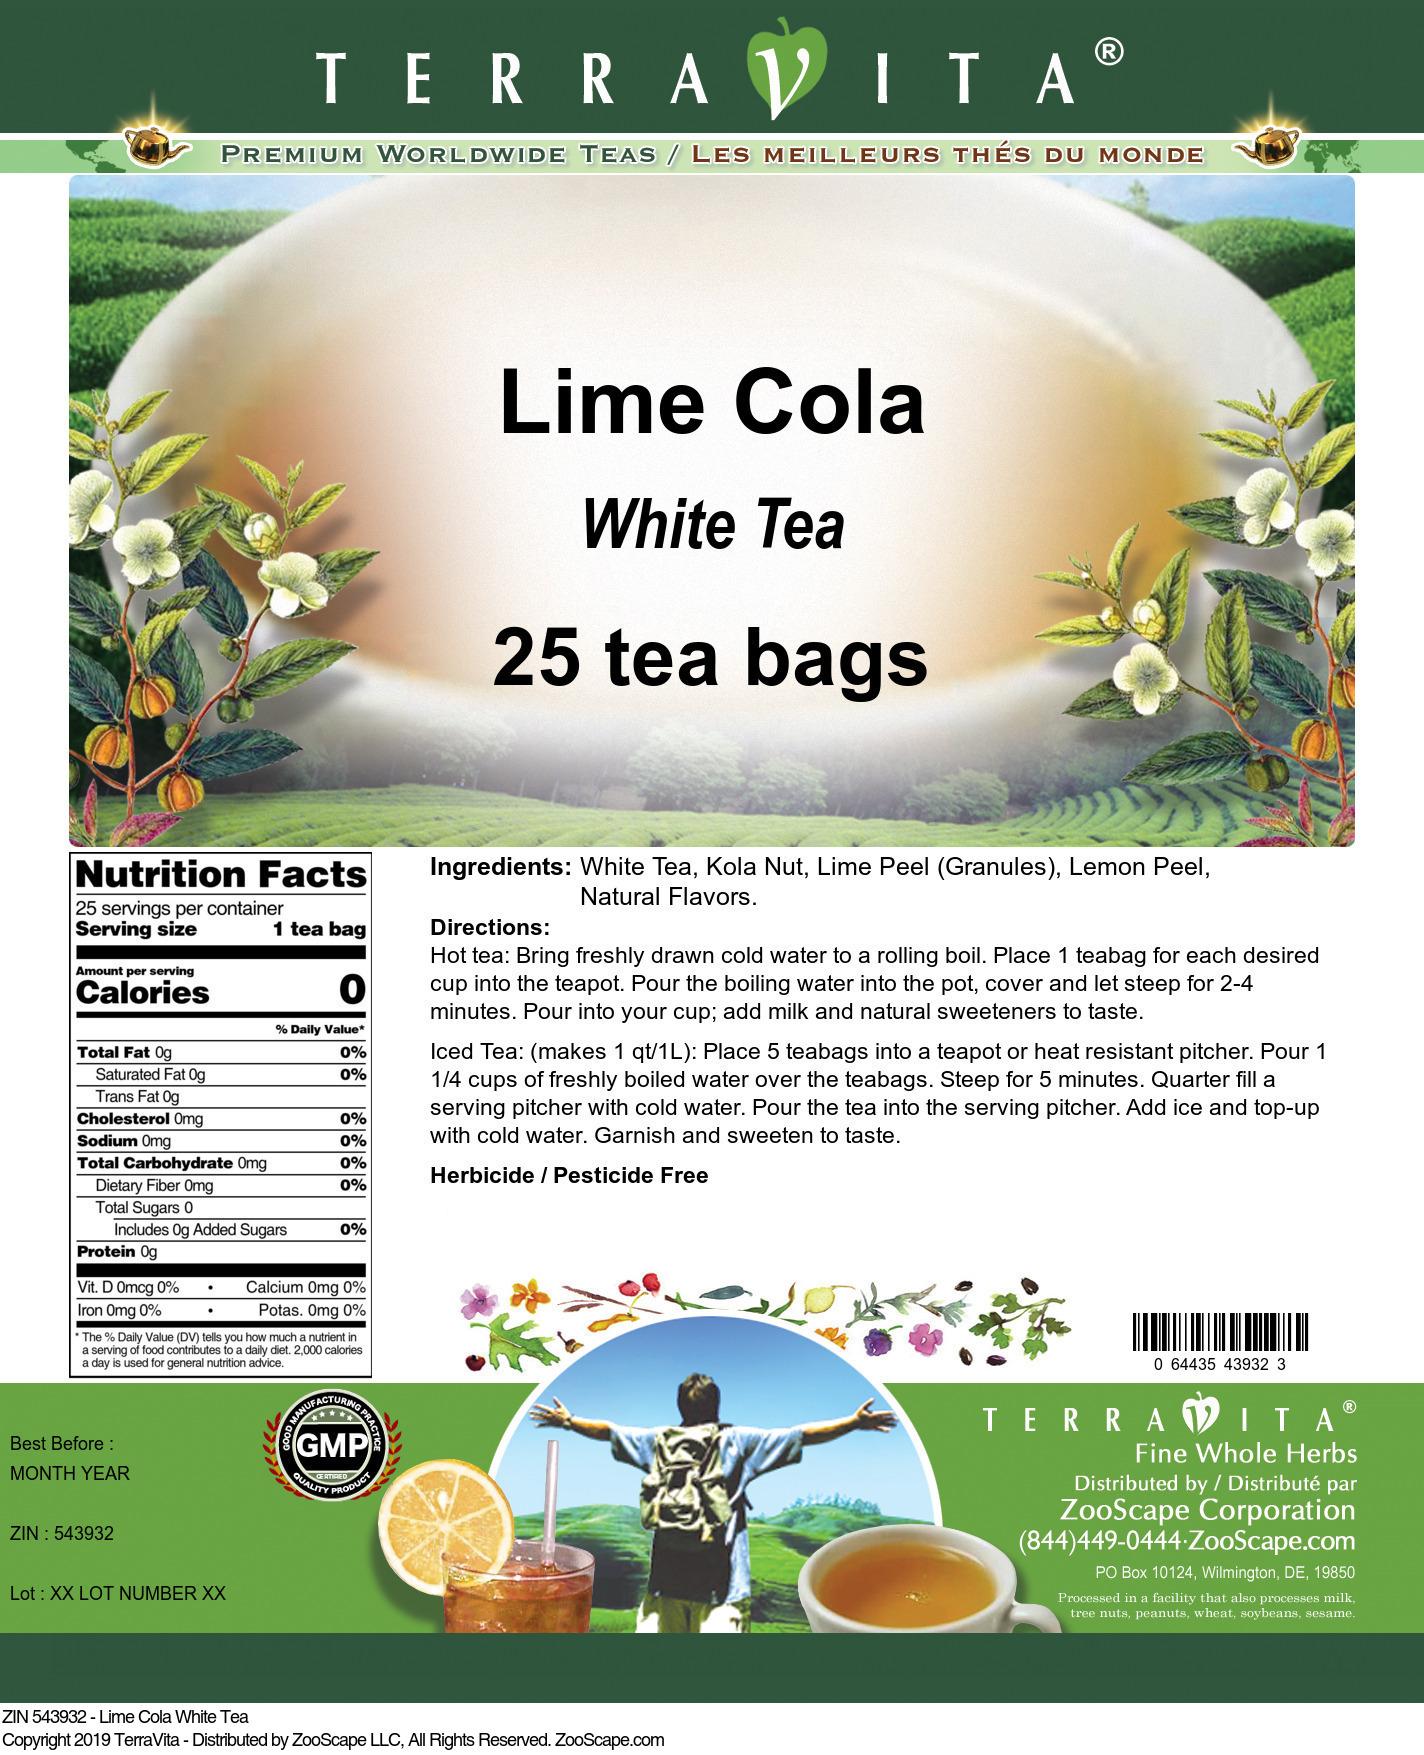 Lime Cola White Tea